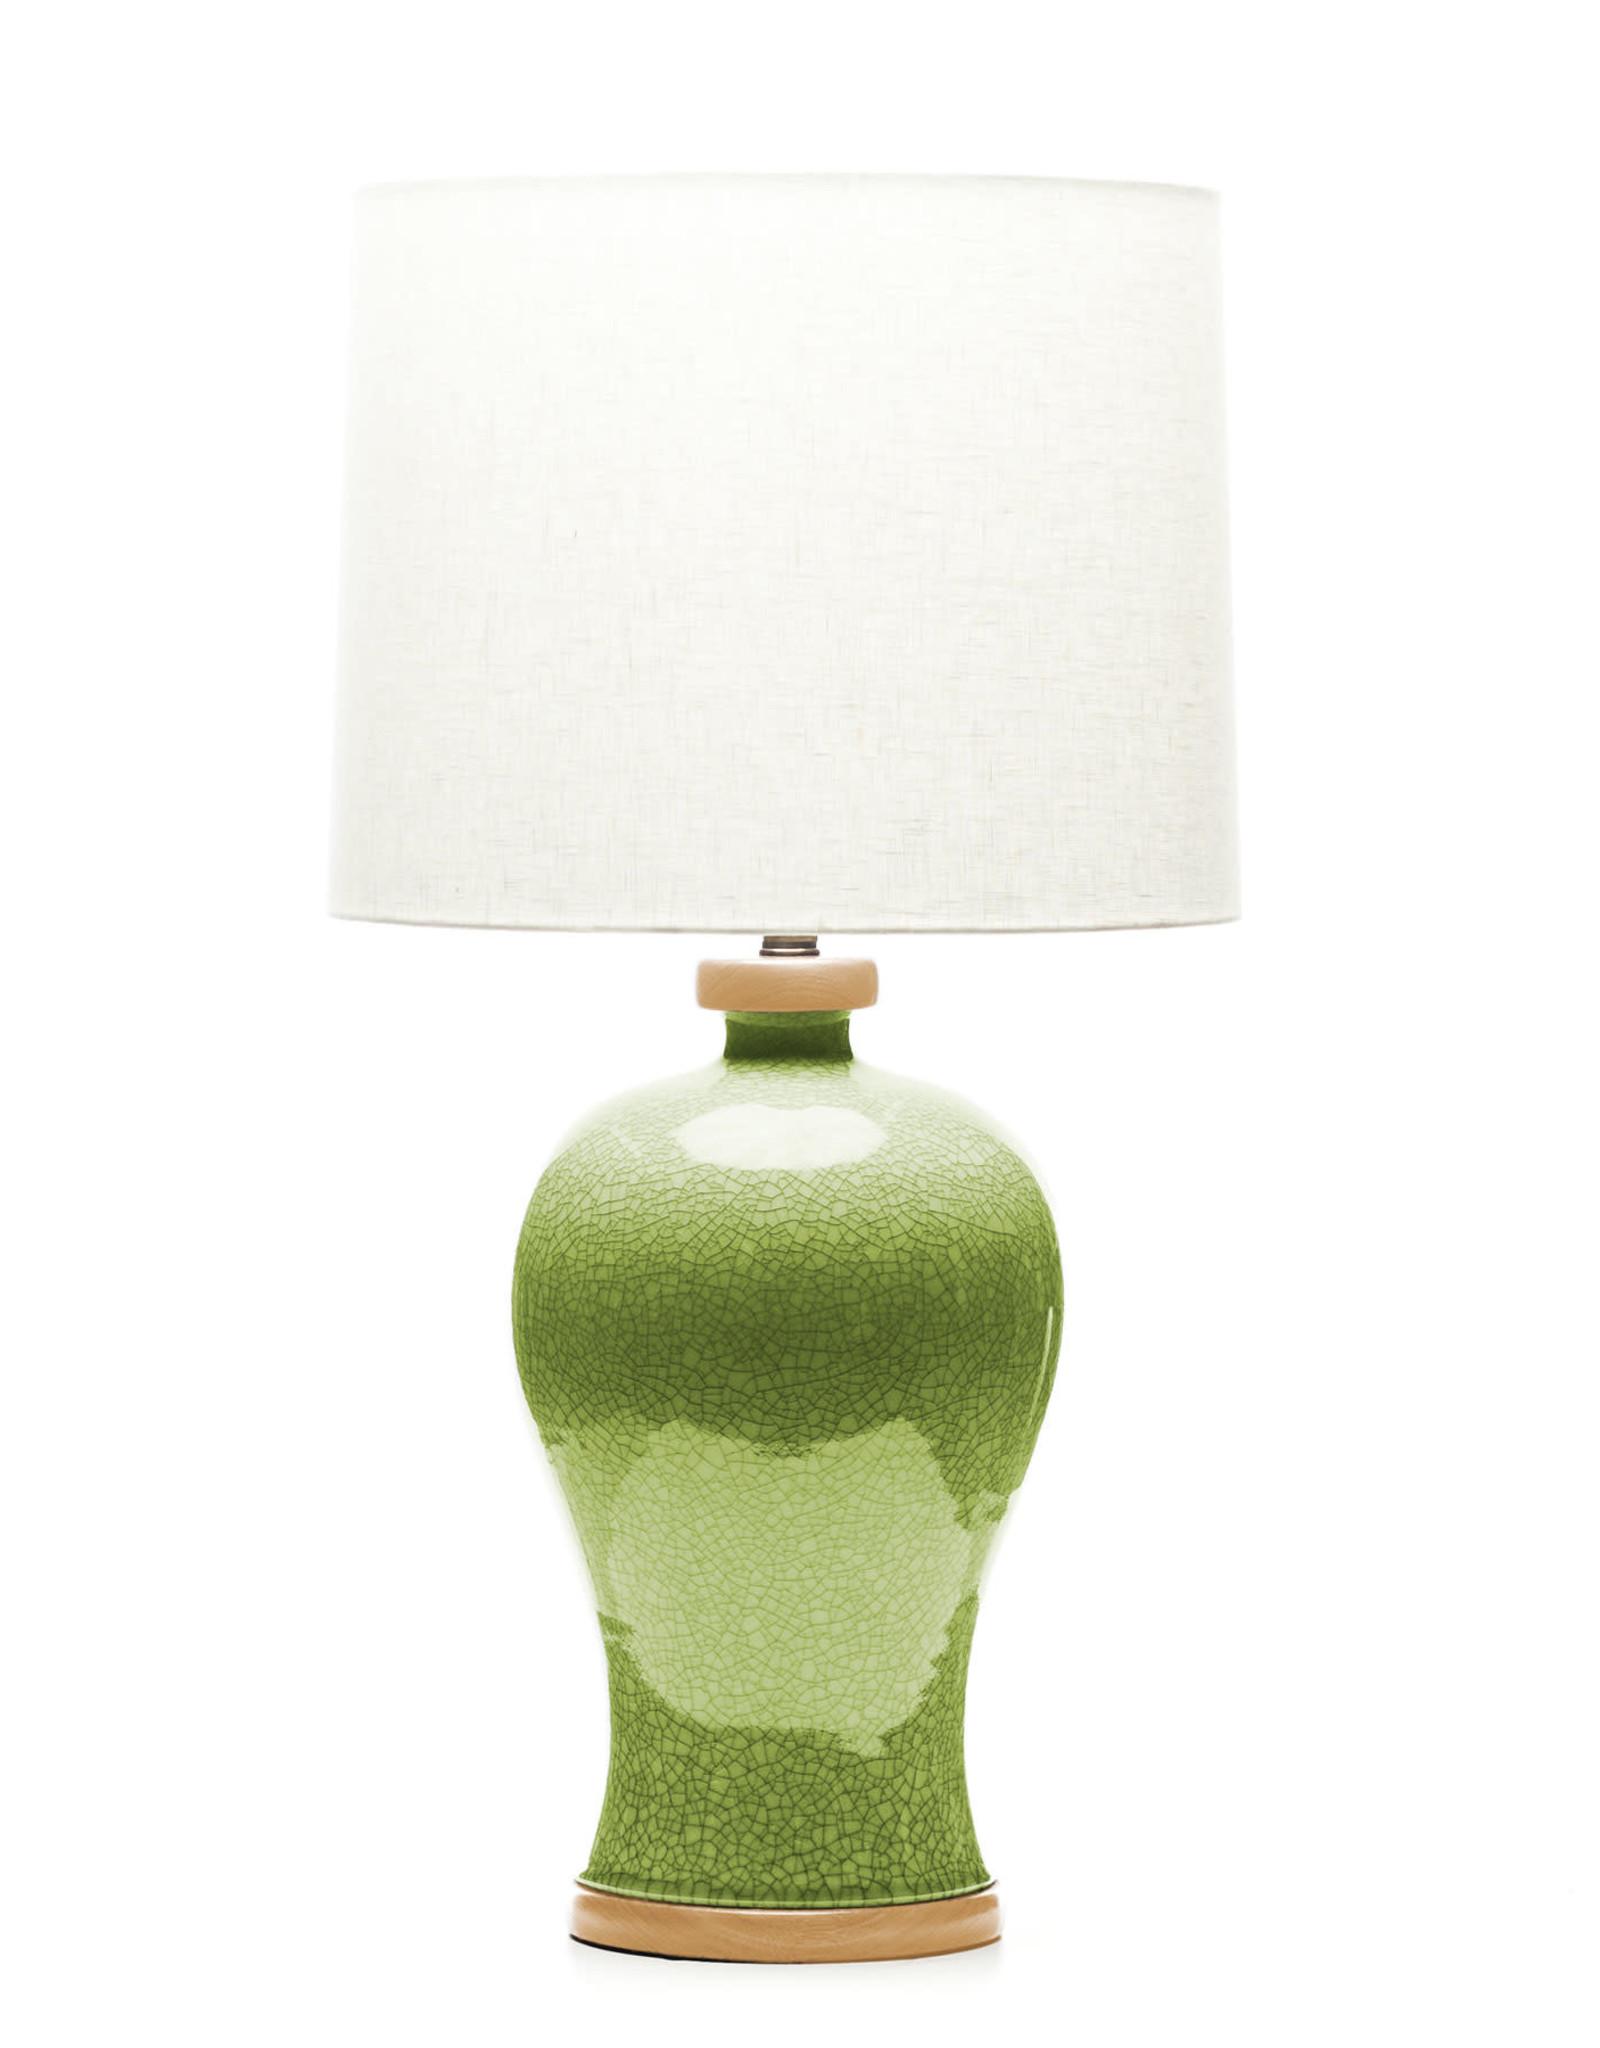 Lawrence & Scott Dashiell Table Lamp in Celadon Crackle (Oak)